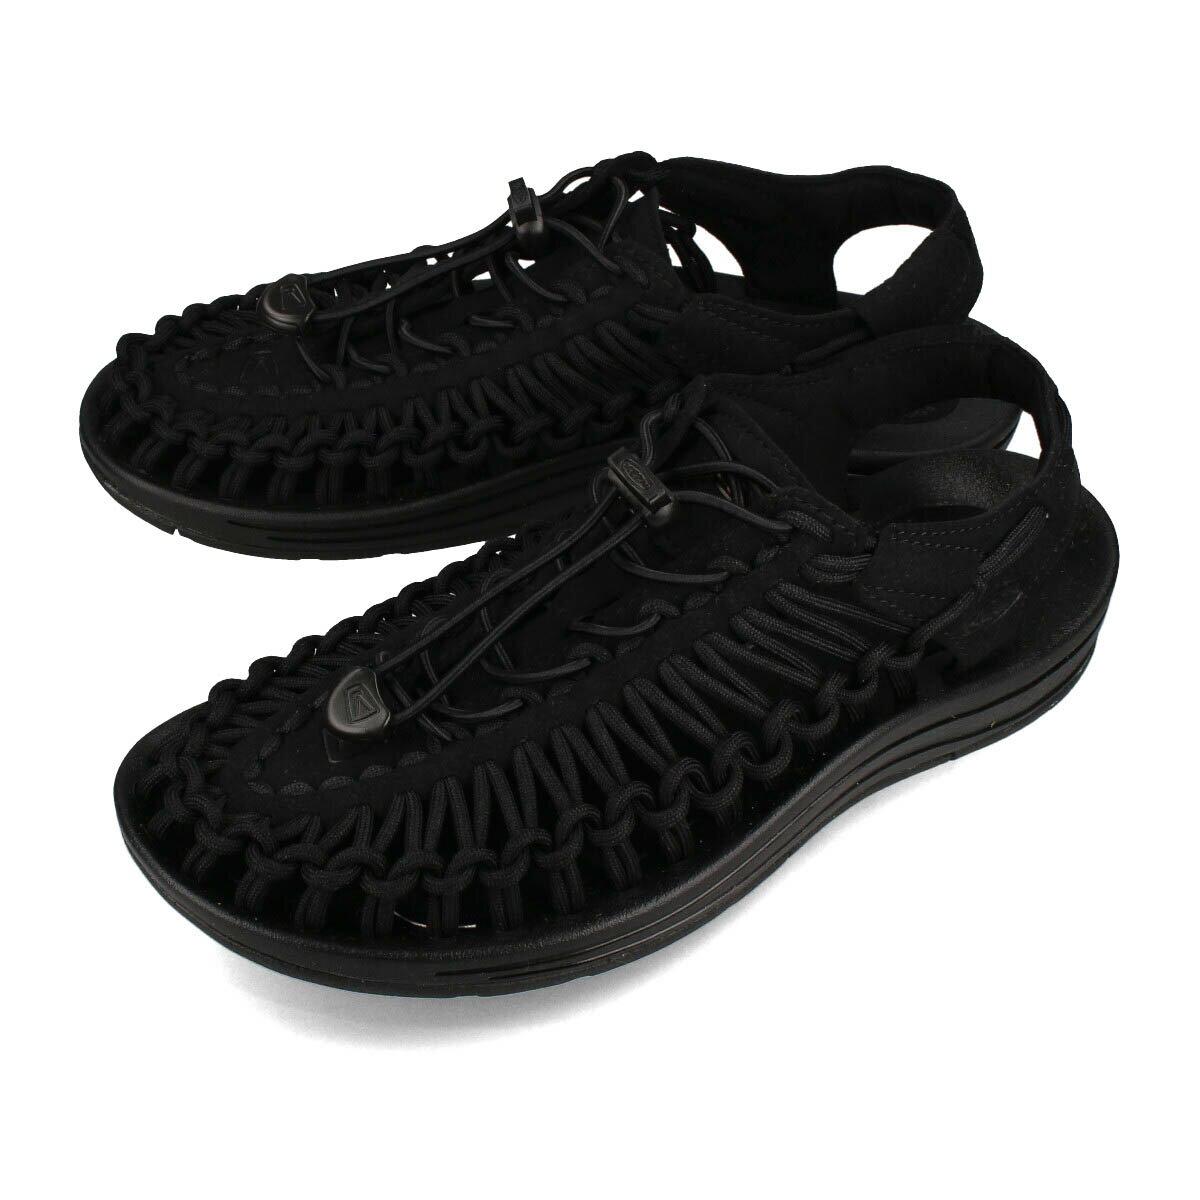 KEEN WOMEN UNEEK 【レディース】 キーン ウーマン ユニーク BLACK/BLACK 1014099